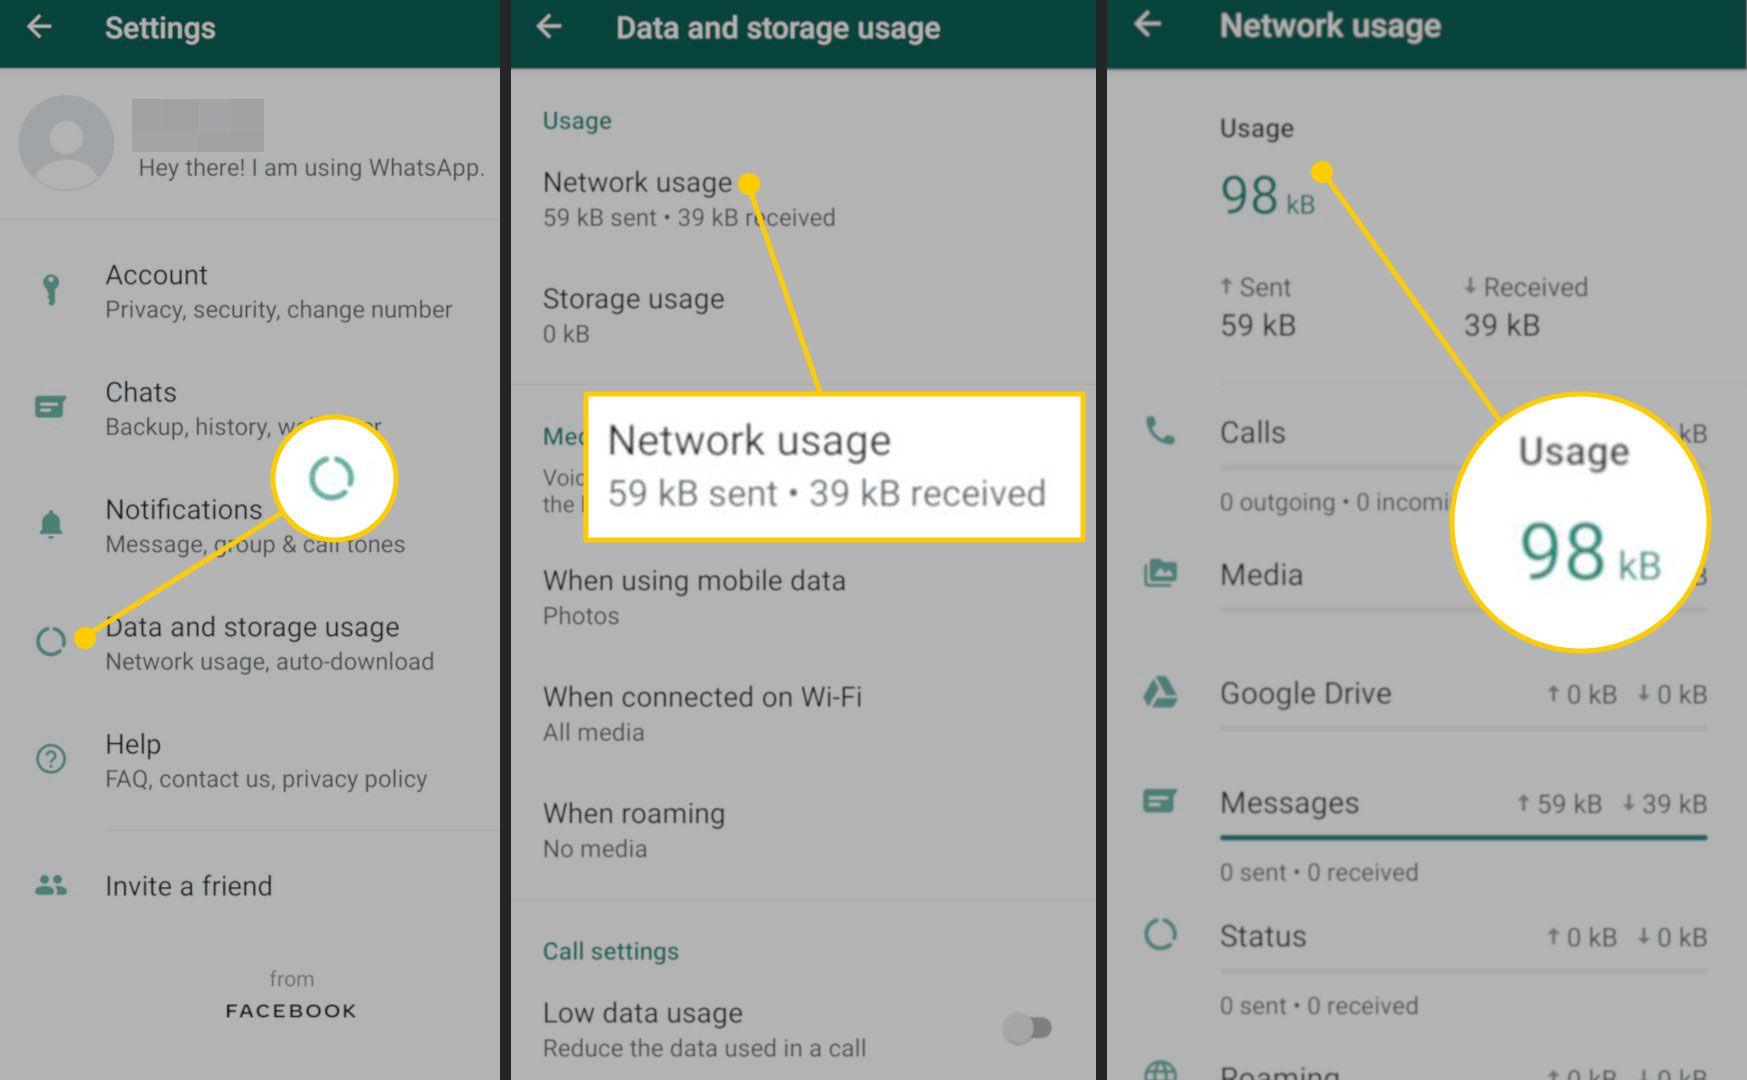 Network Usage menu in WhatsApp